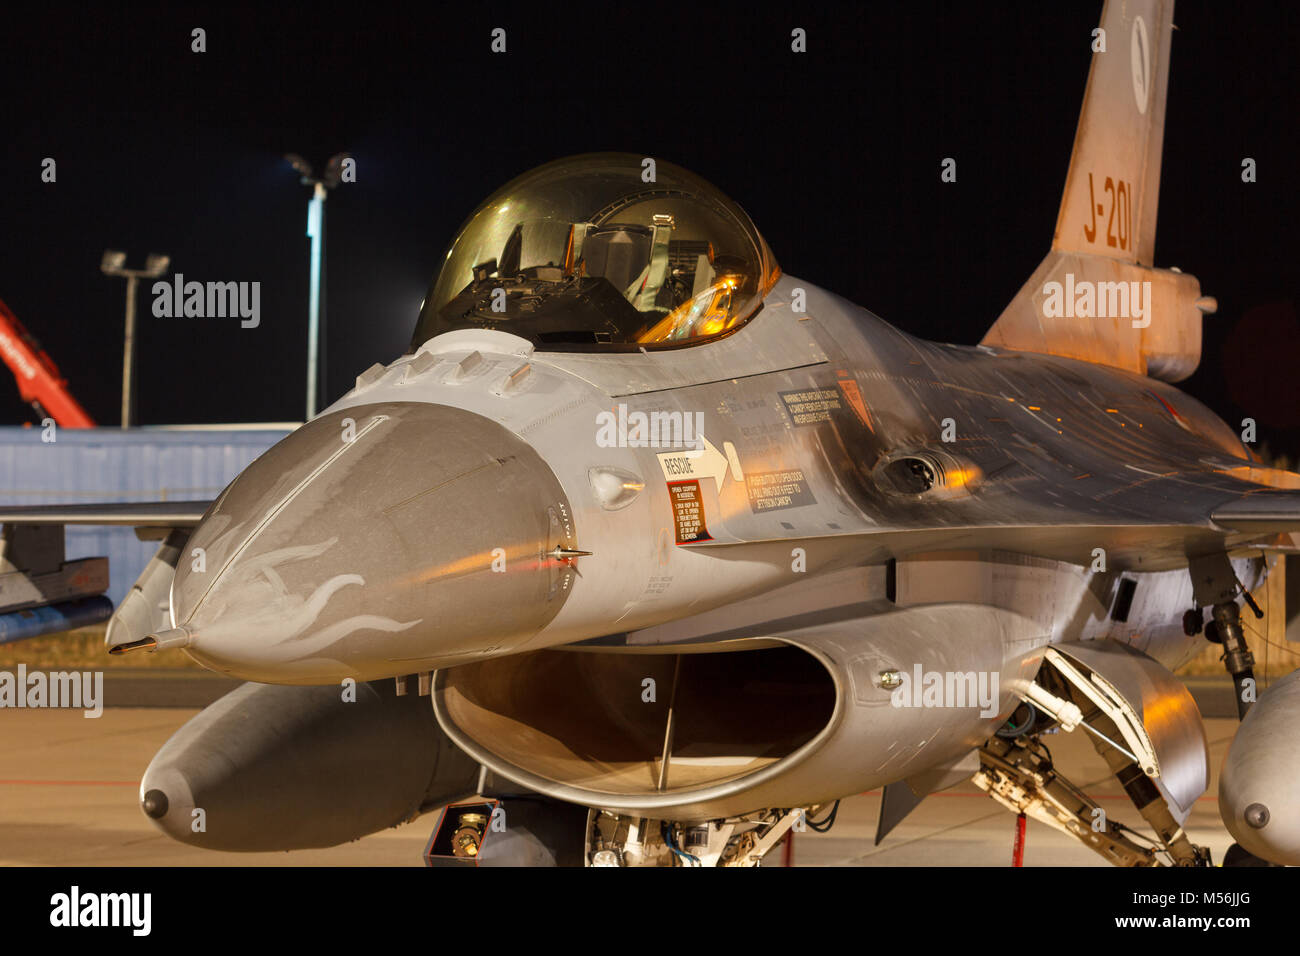 Leeuwarden Feb 6 2018: Night flight Exercise. F-16 Fighting Falcon. - Stock Image